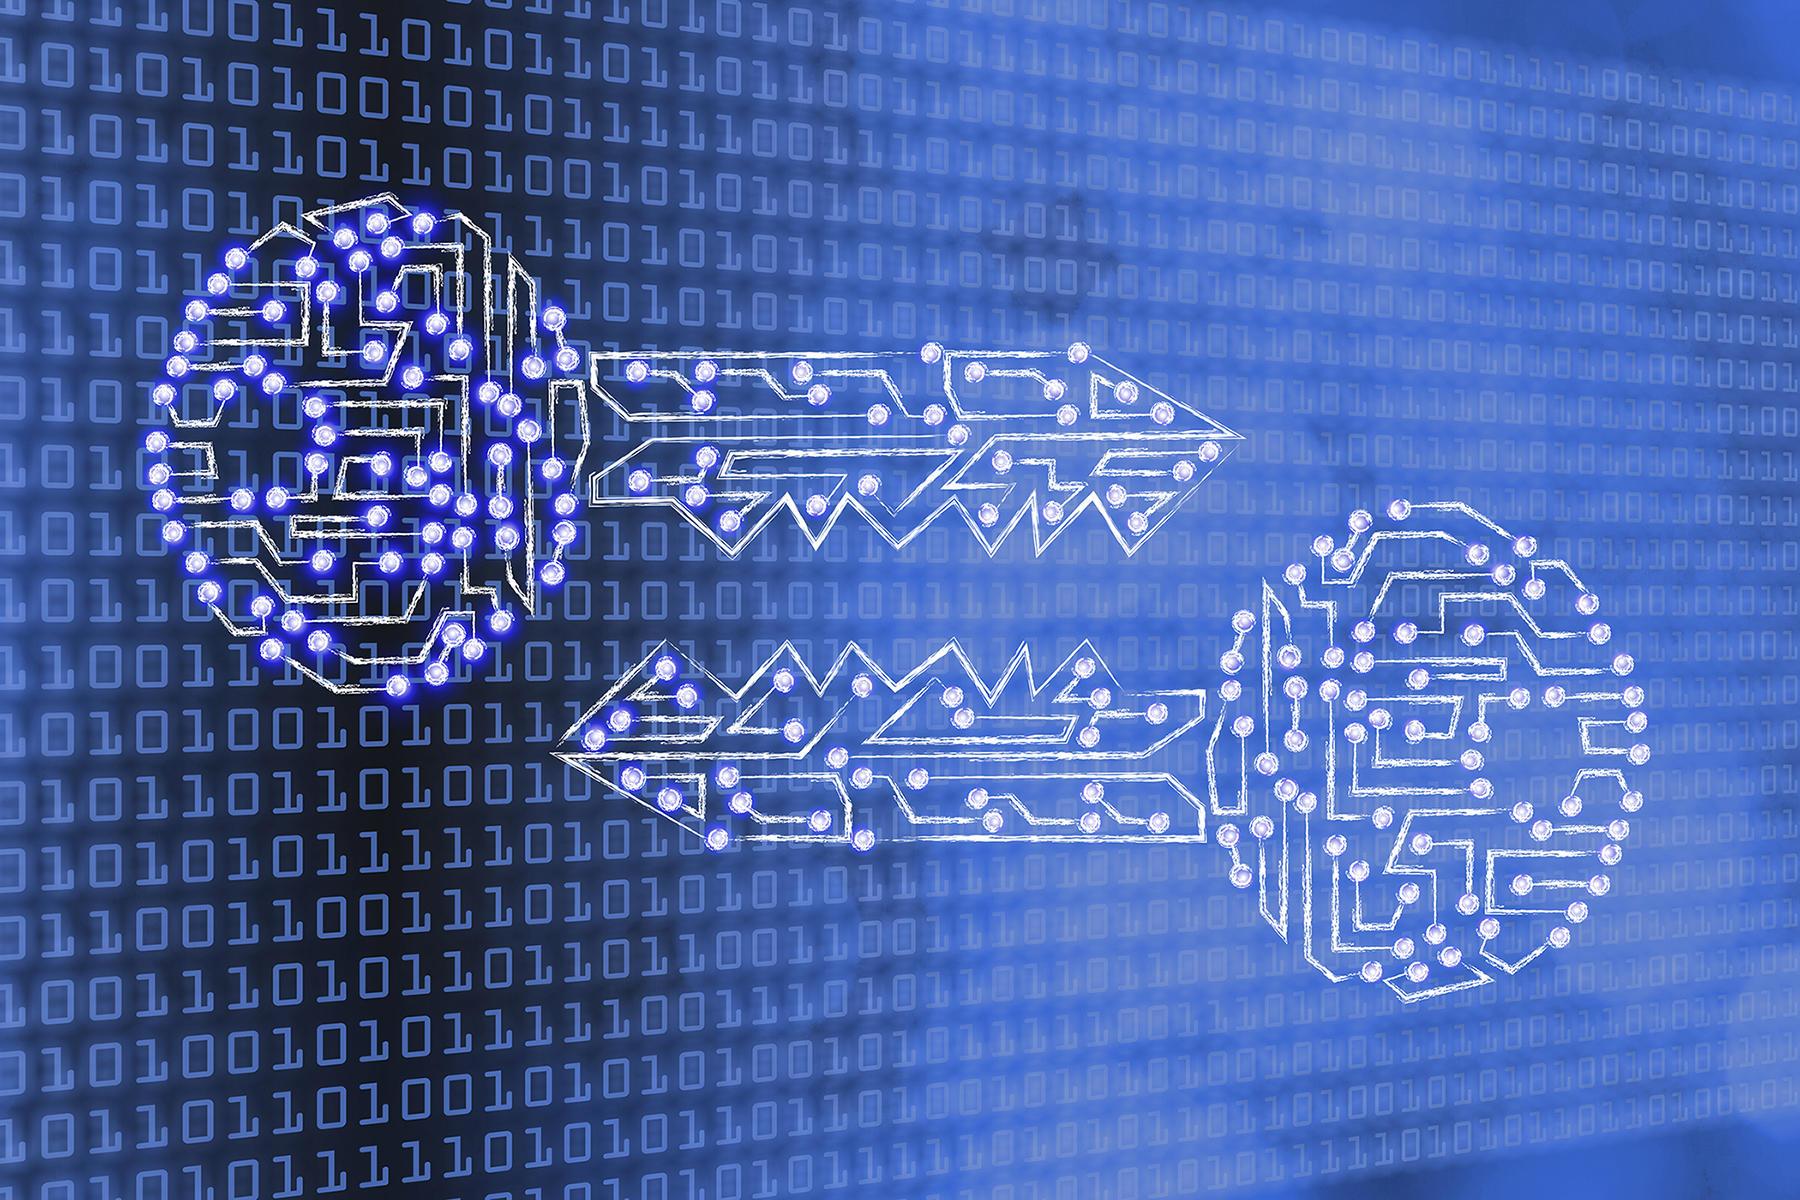 NIST's Encryption Standard Has Minimum $250 Billion Economic Benefit, According to New Study | NIST